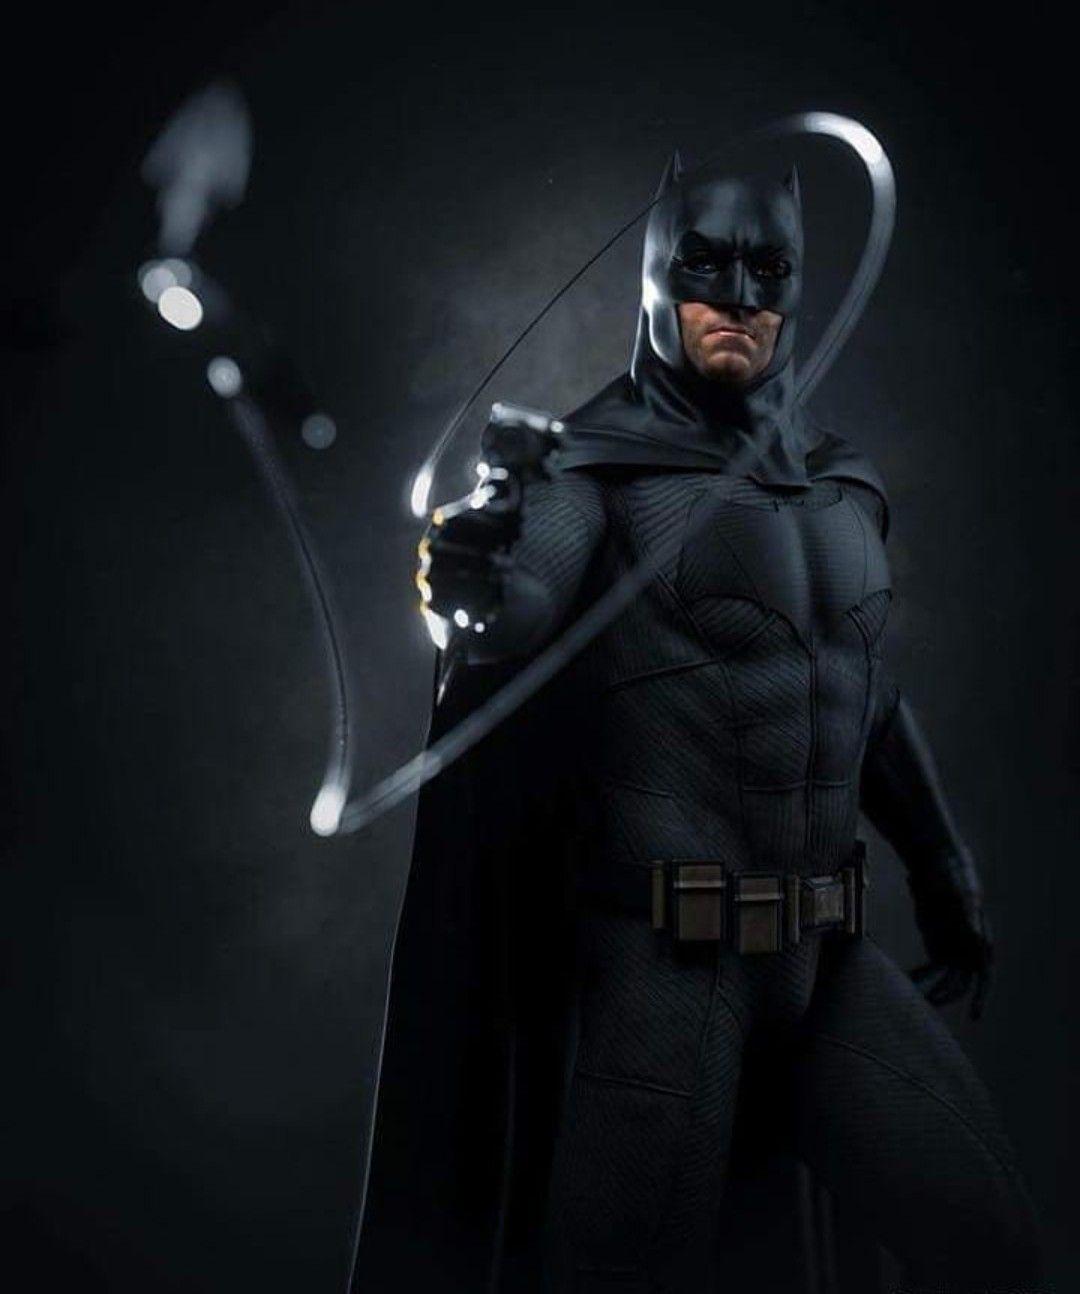 Batman, Batman Universe, Superhero Villains